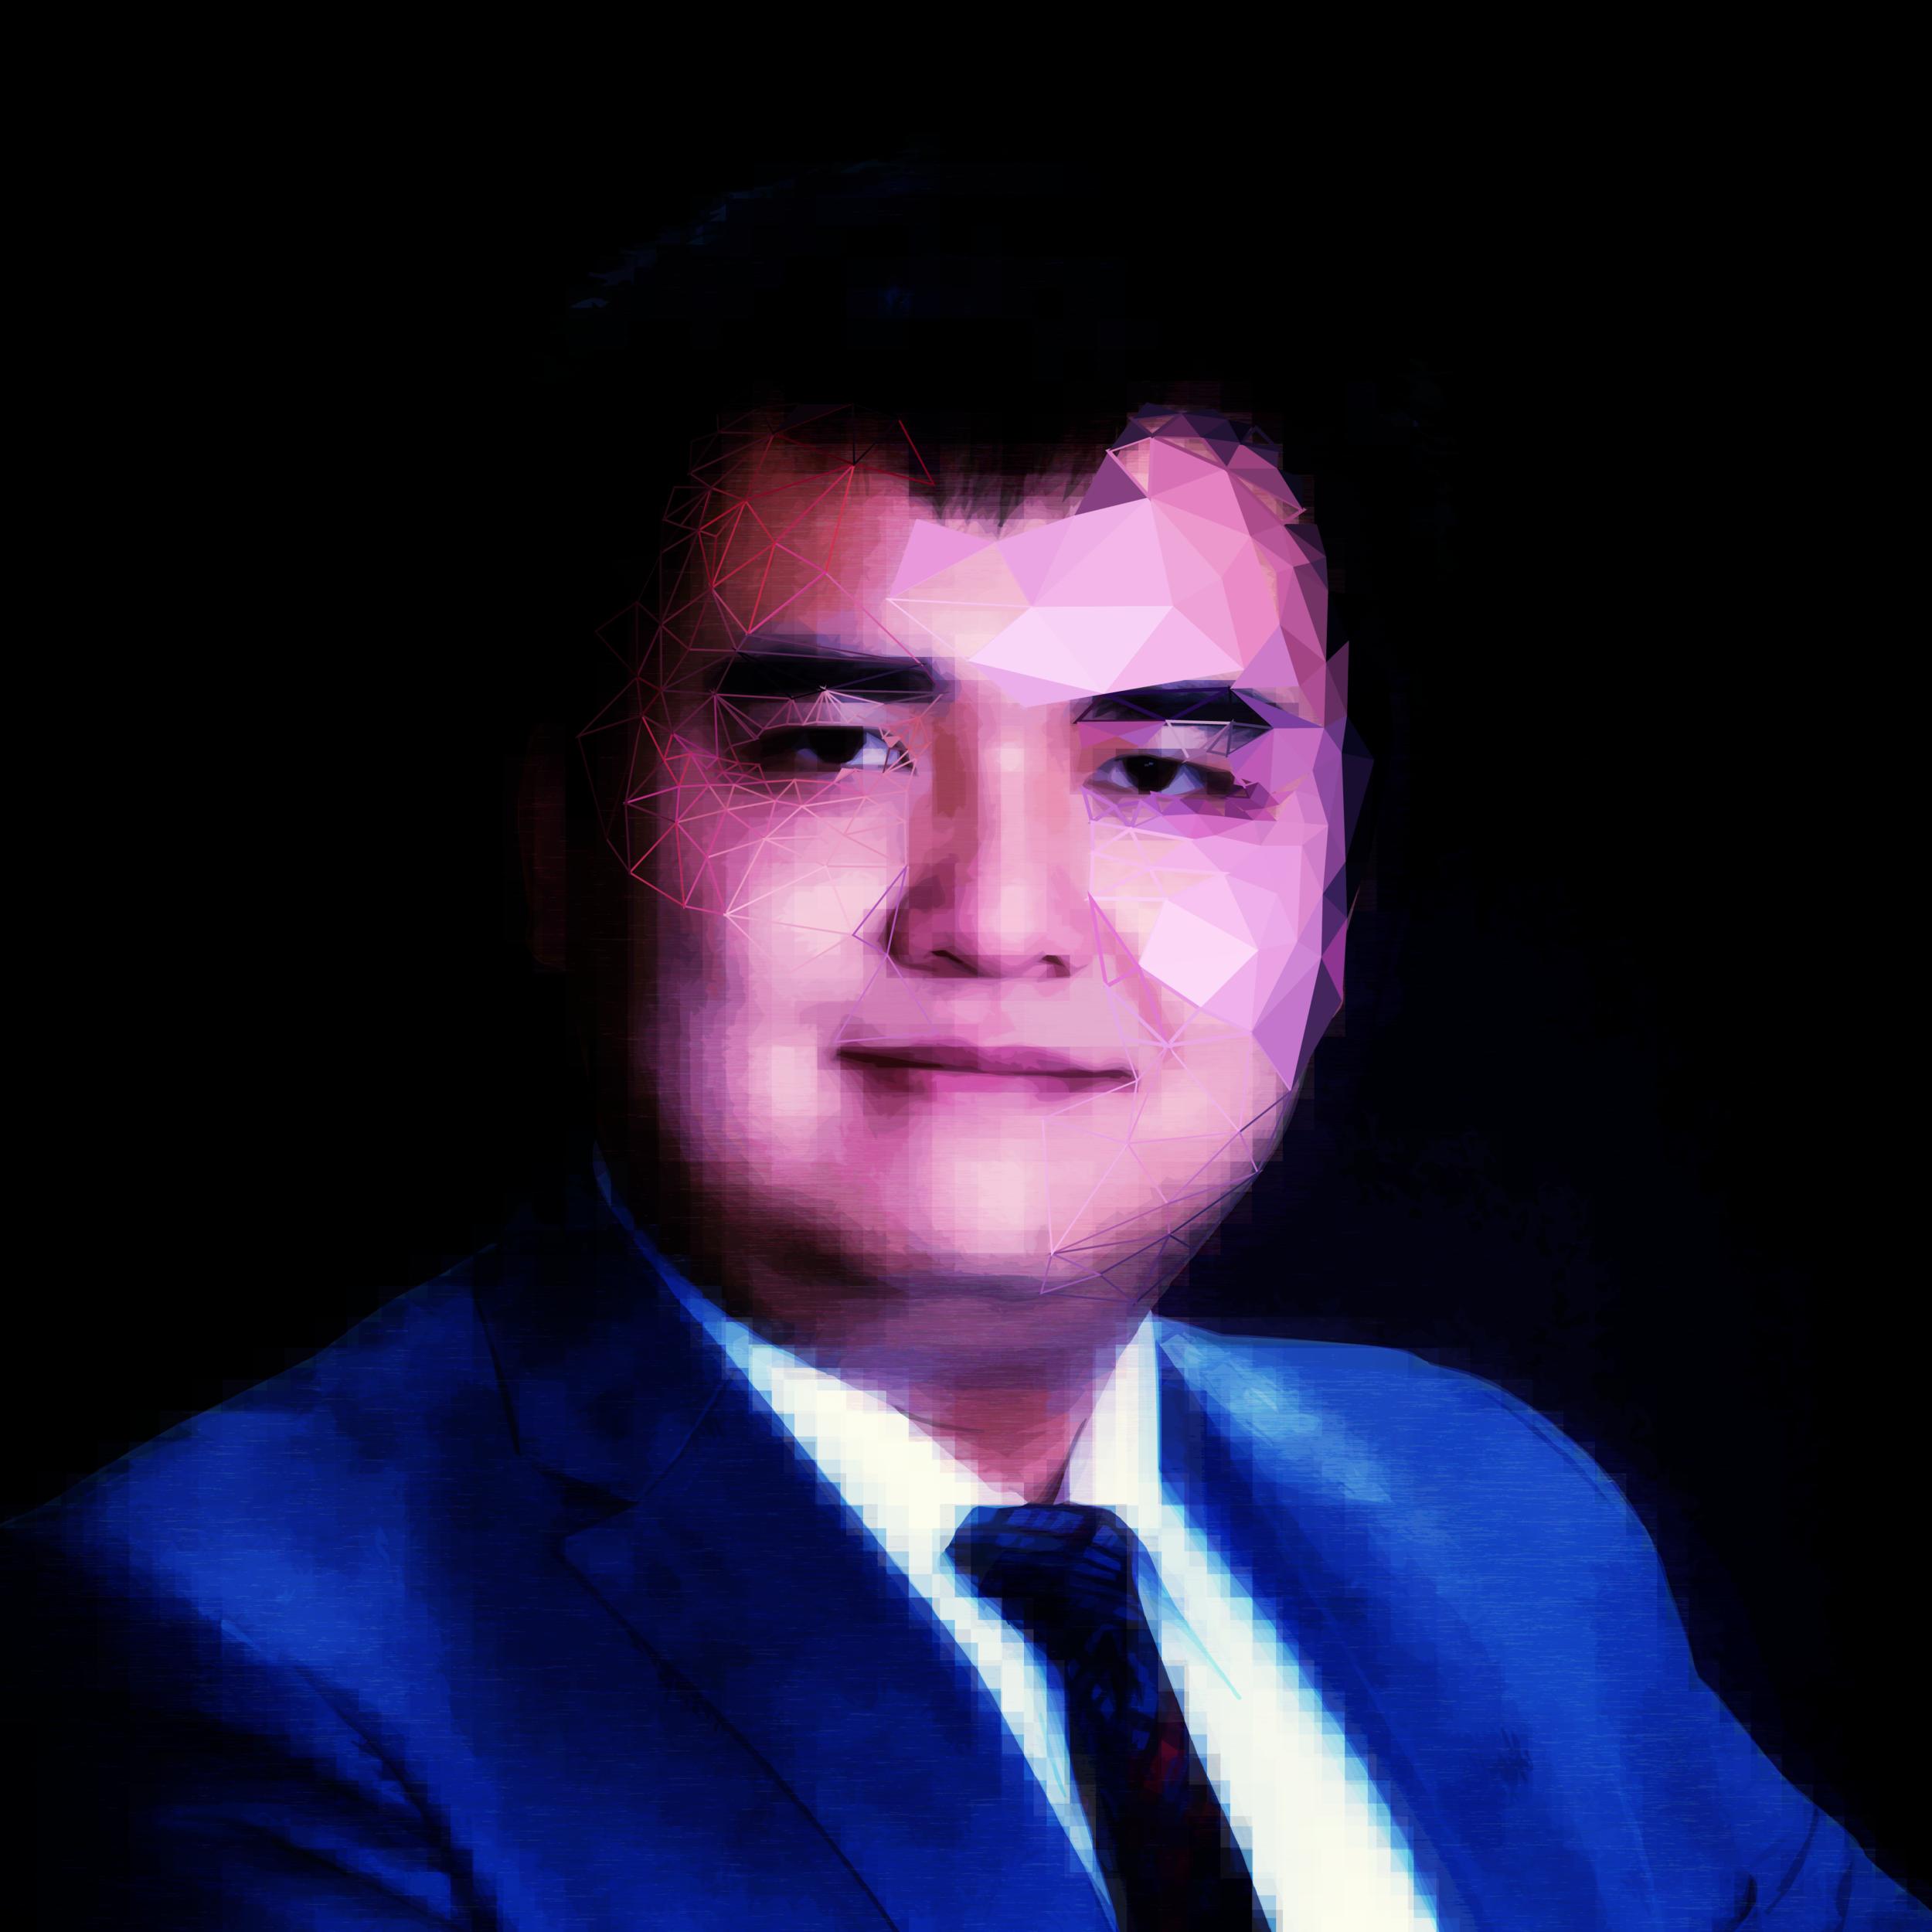 Ethan Li - Designer, software engineer